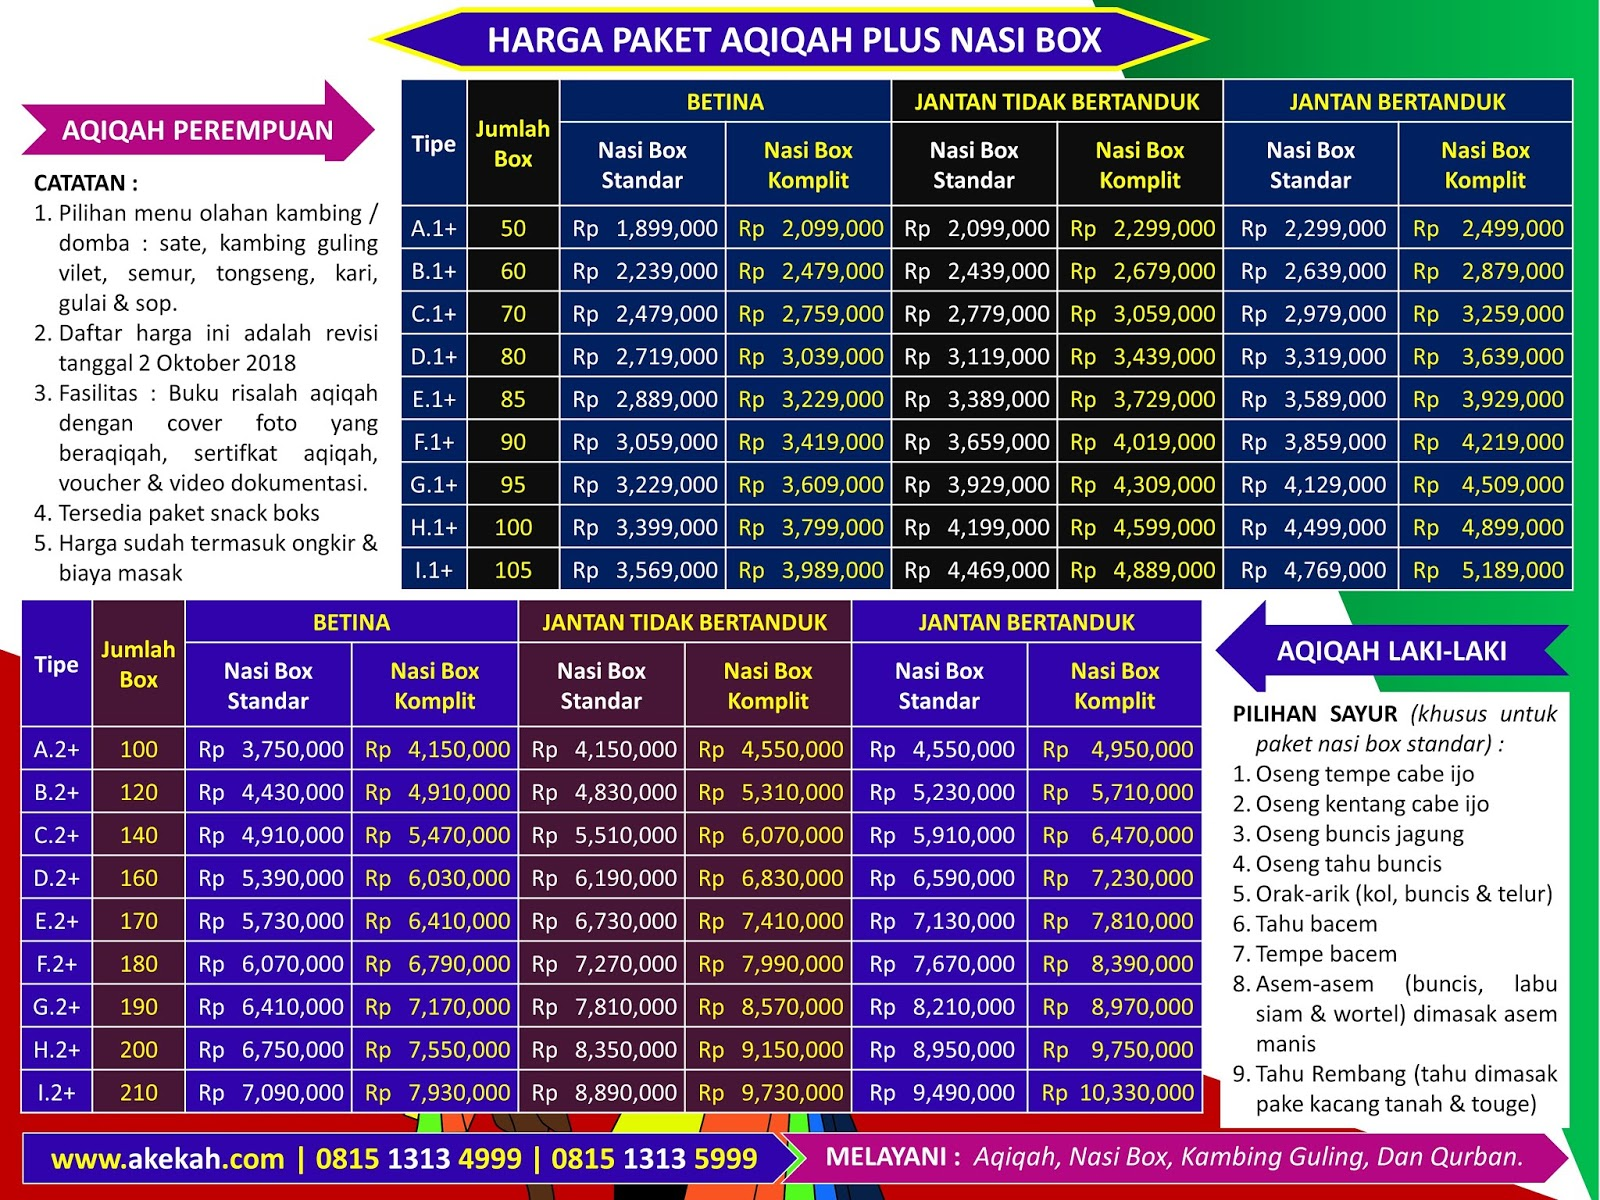 Akikah & Catering Untuk Anak Laki-Laki Kecamatan Jasinga Kabupaten Bogor Jawa Barat